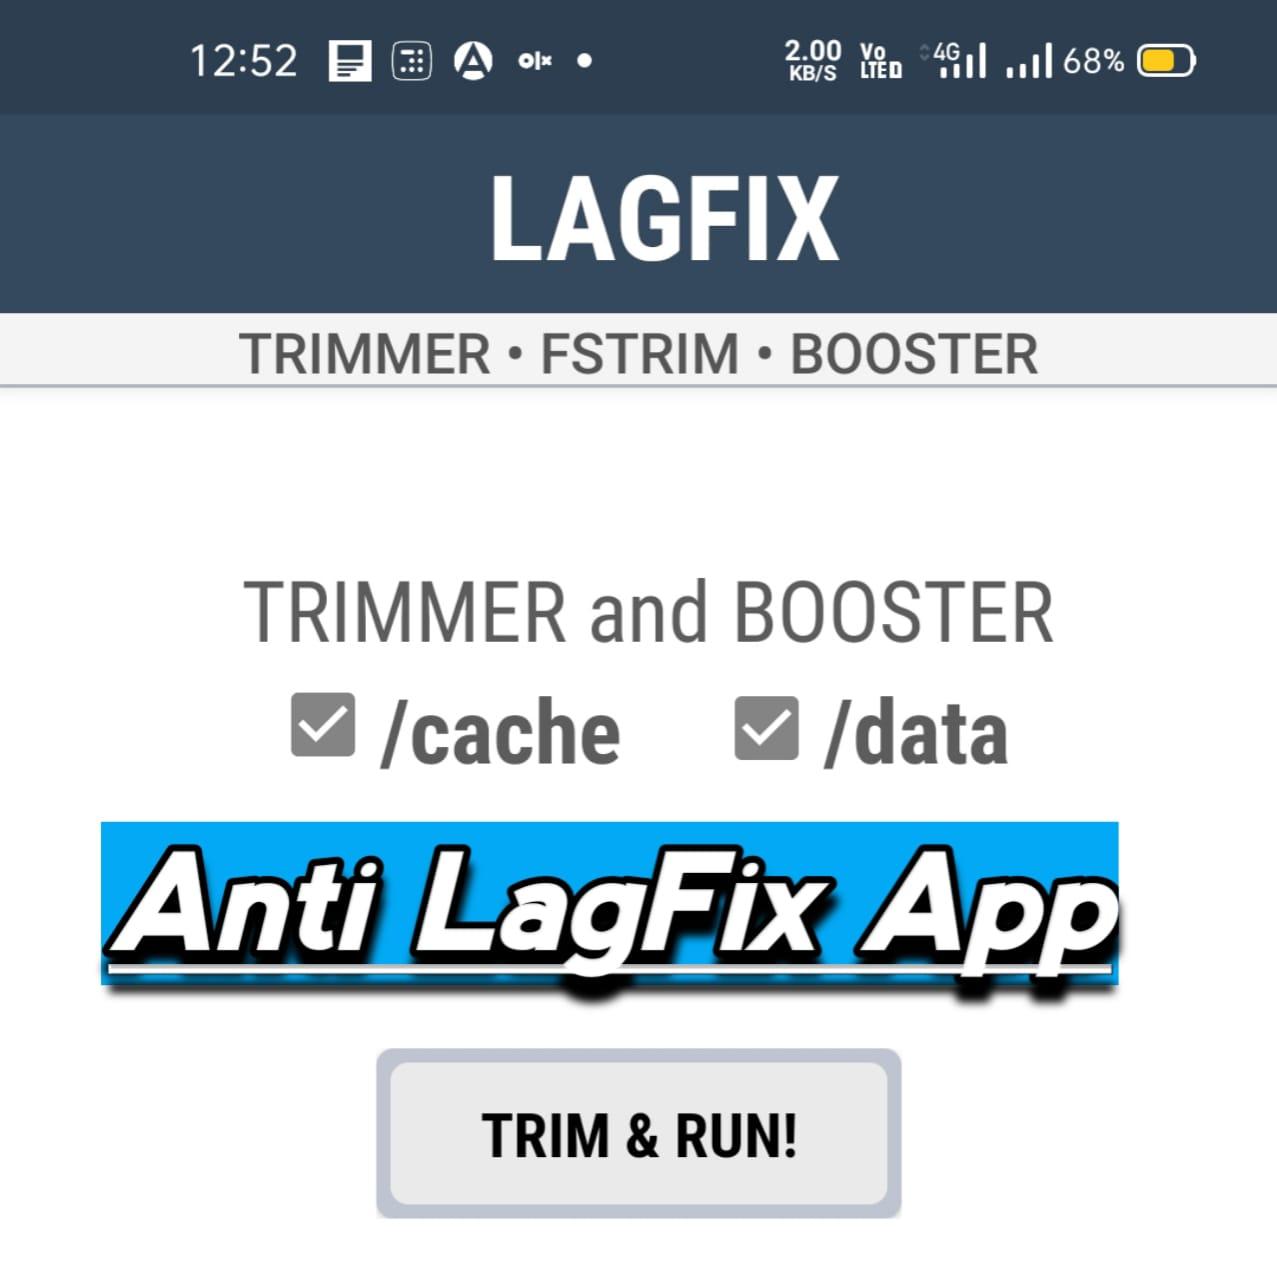 LagFix fstrim App For Android, Best Anti Lag App